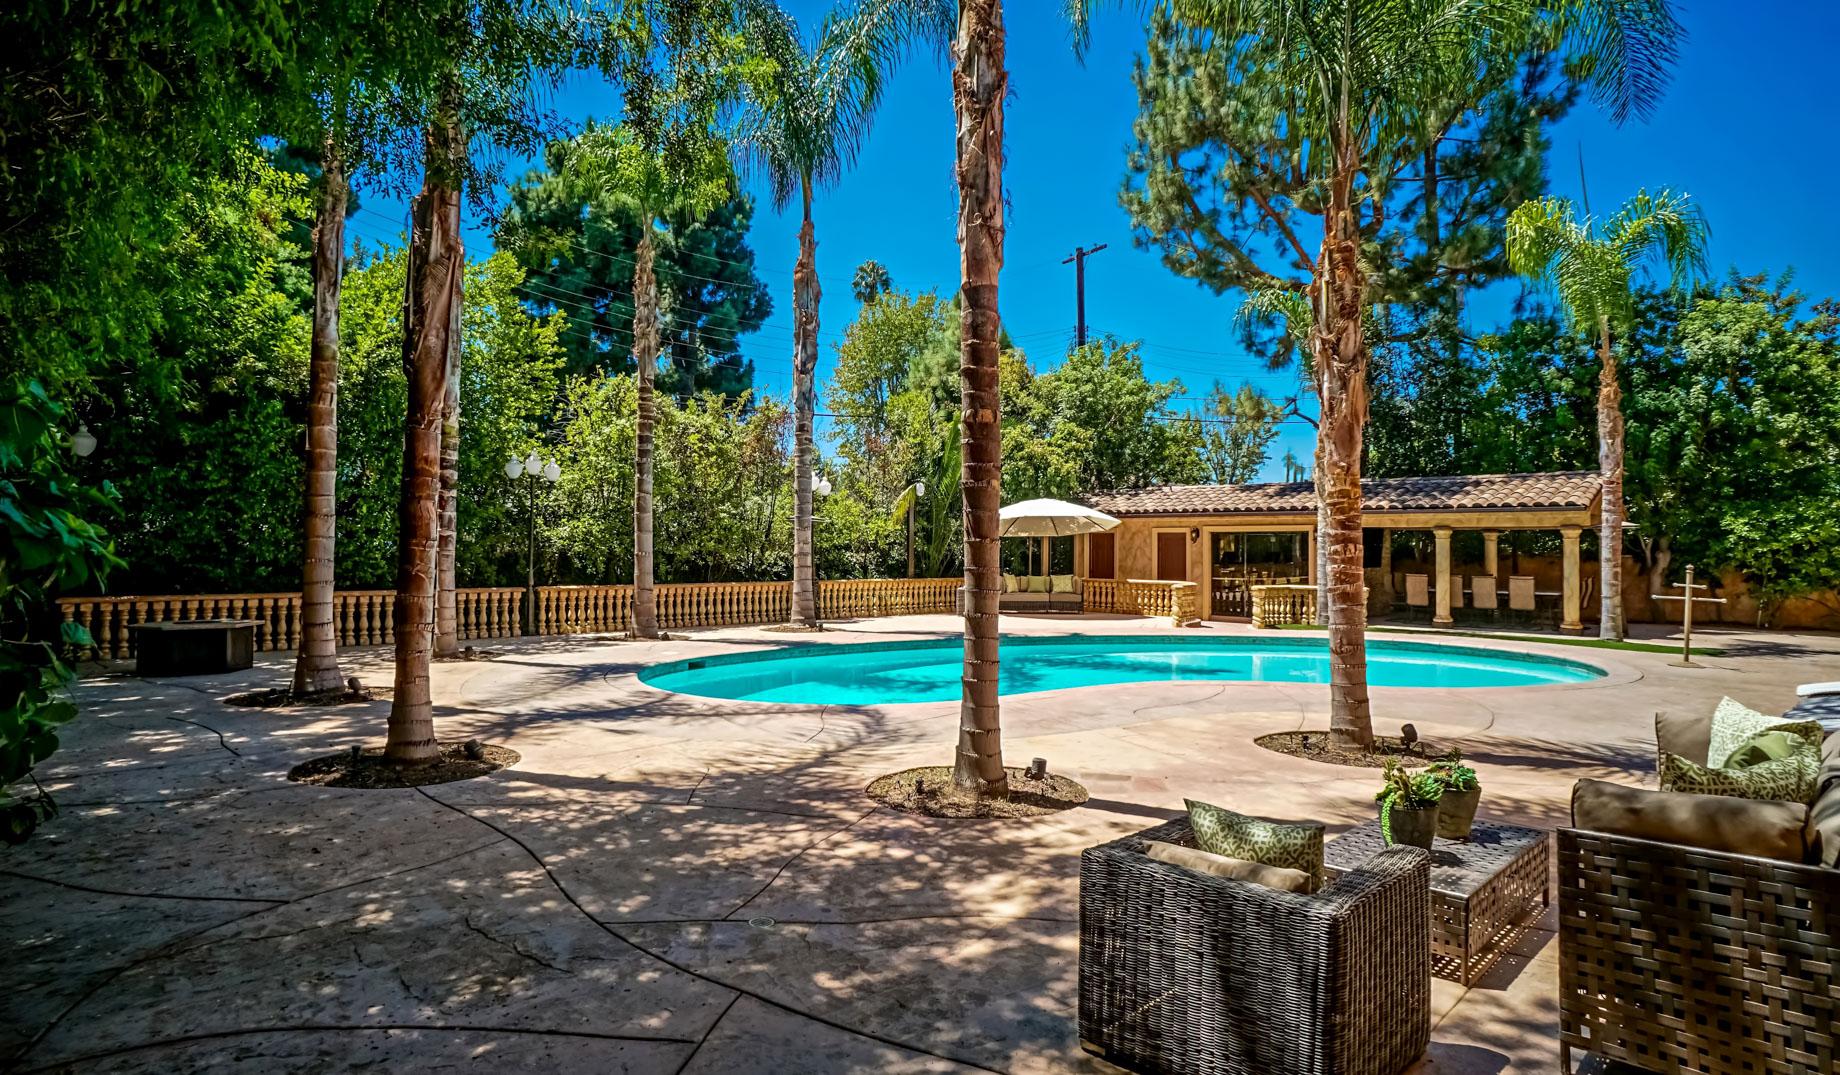 Chandler Estates Home - 13854 Albers St, Los Angeles, CA, USA